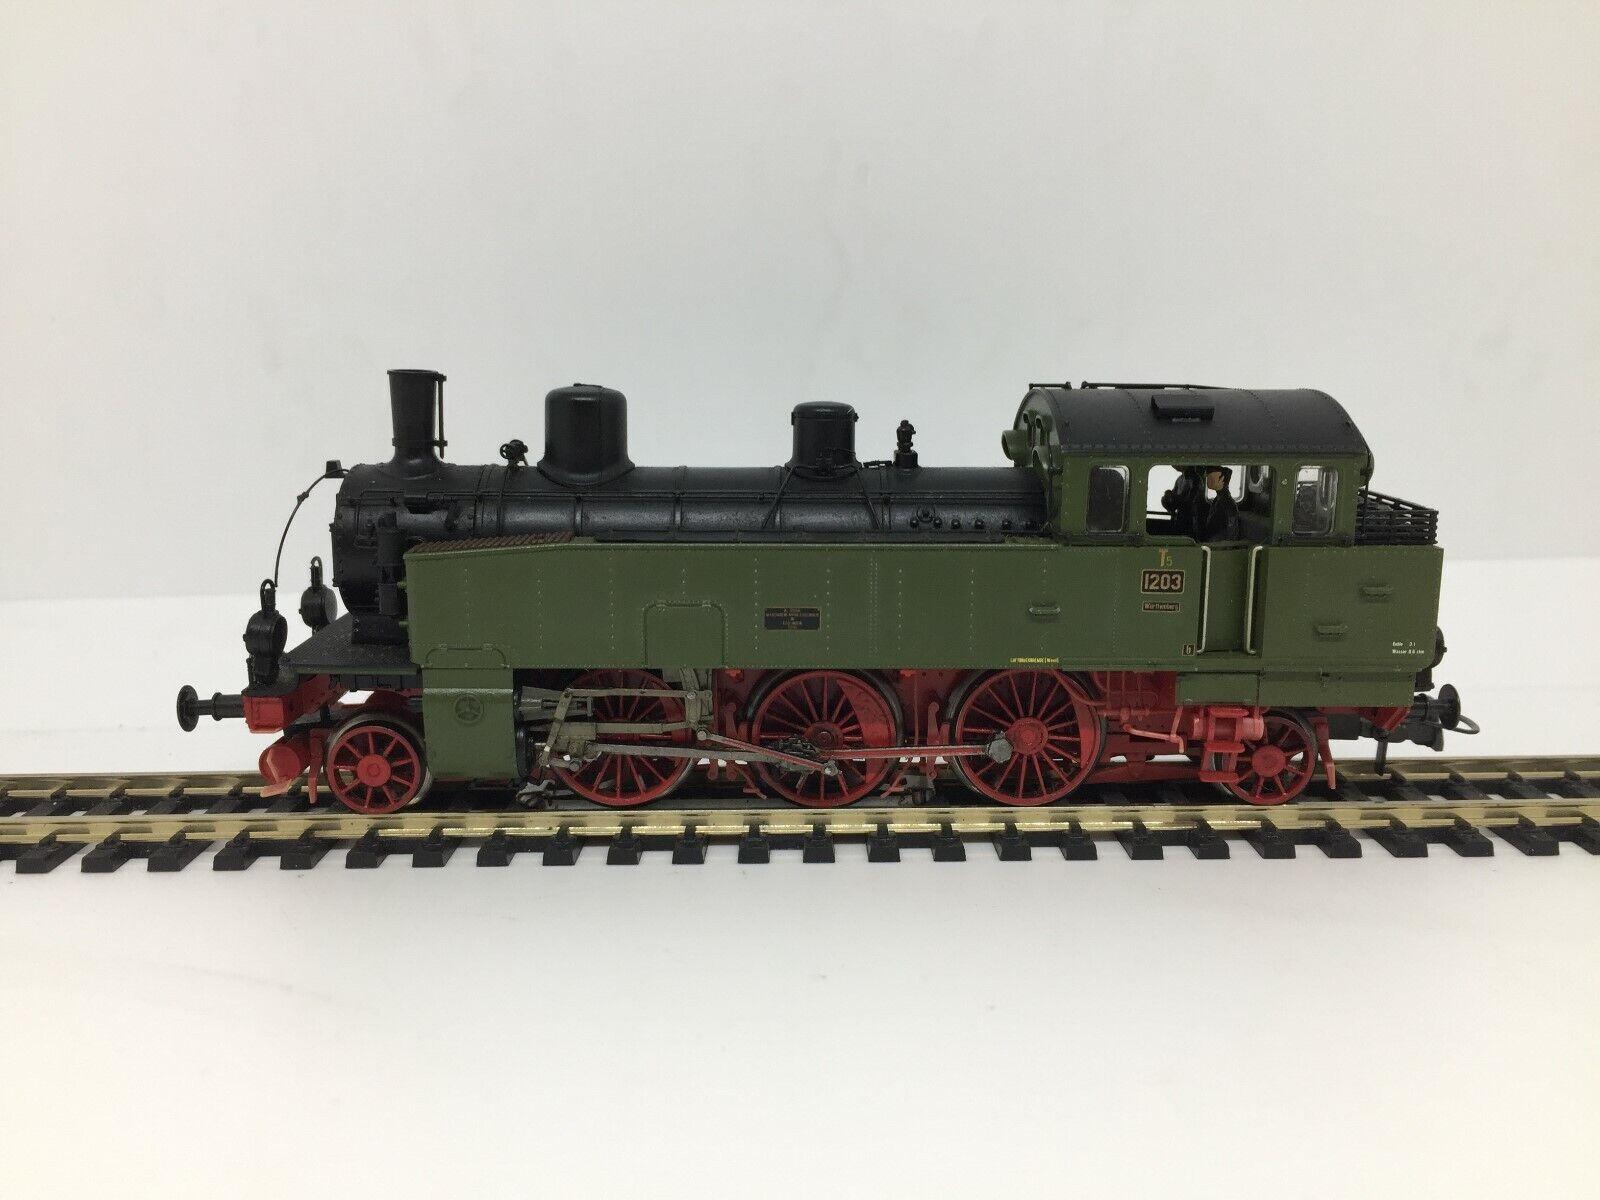 Locomotora braawa Ho vapeur t5 1203 en 3 Rails R - f.40003 digitale Sonore